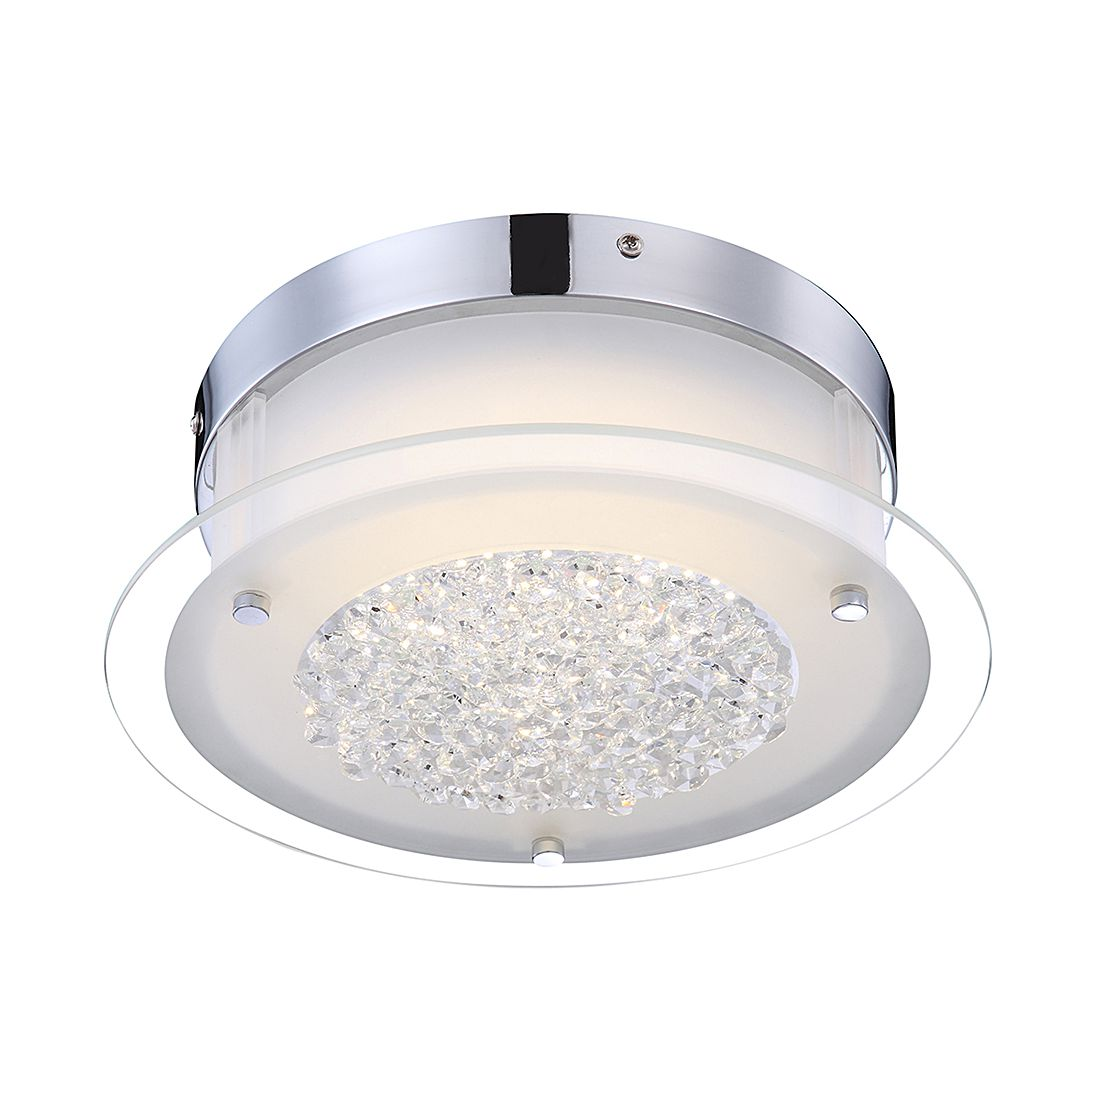 Deckenleuchte Leah I - Metall - Silber - 1-flammig, Globo Lighting